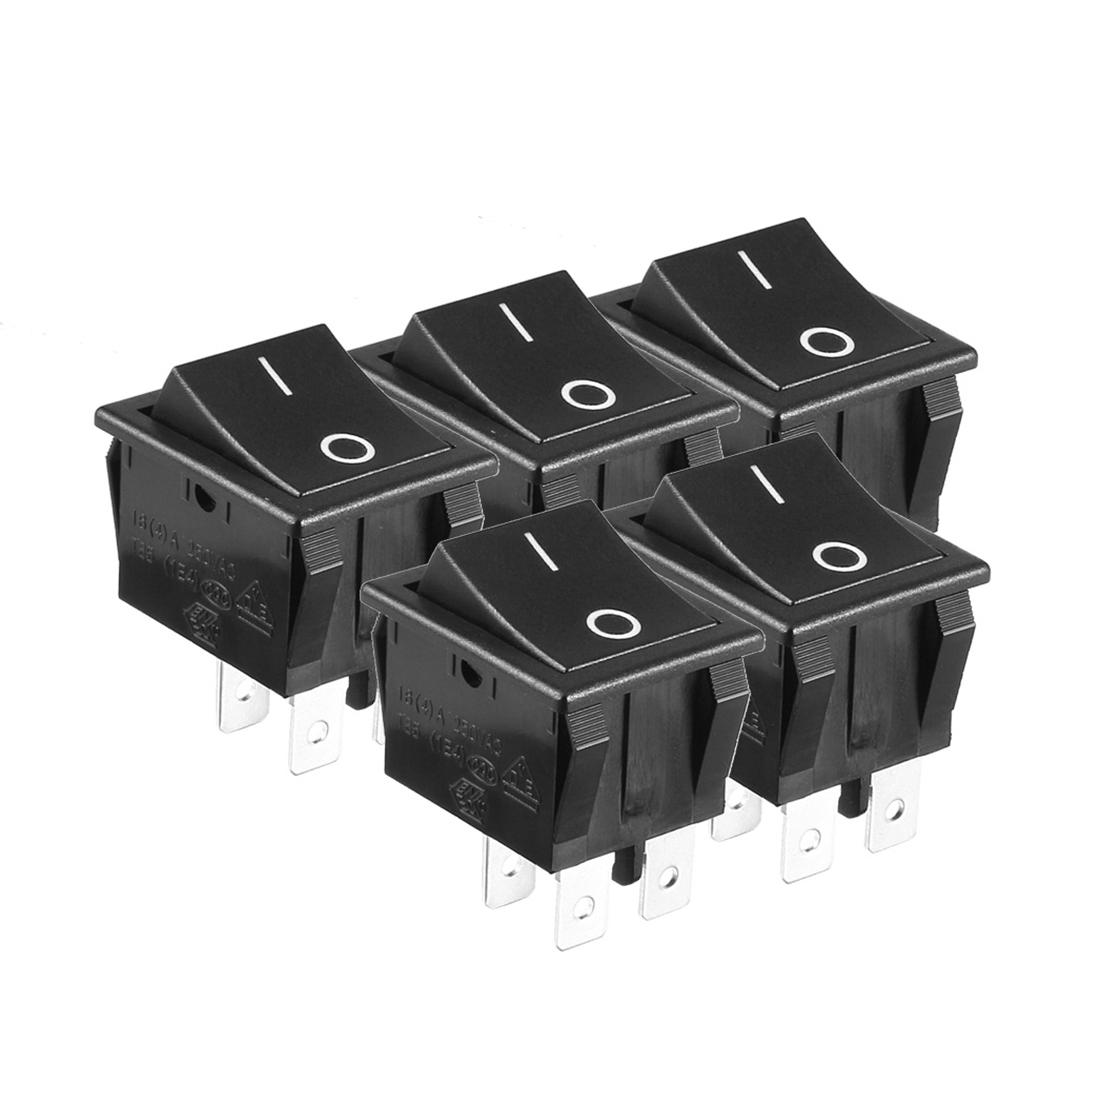 5pcs AC 250V/125V 16A On/Off 2 Position DPST Rocker Switch Latching